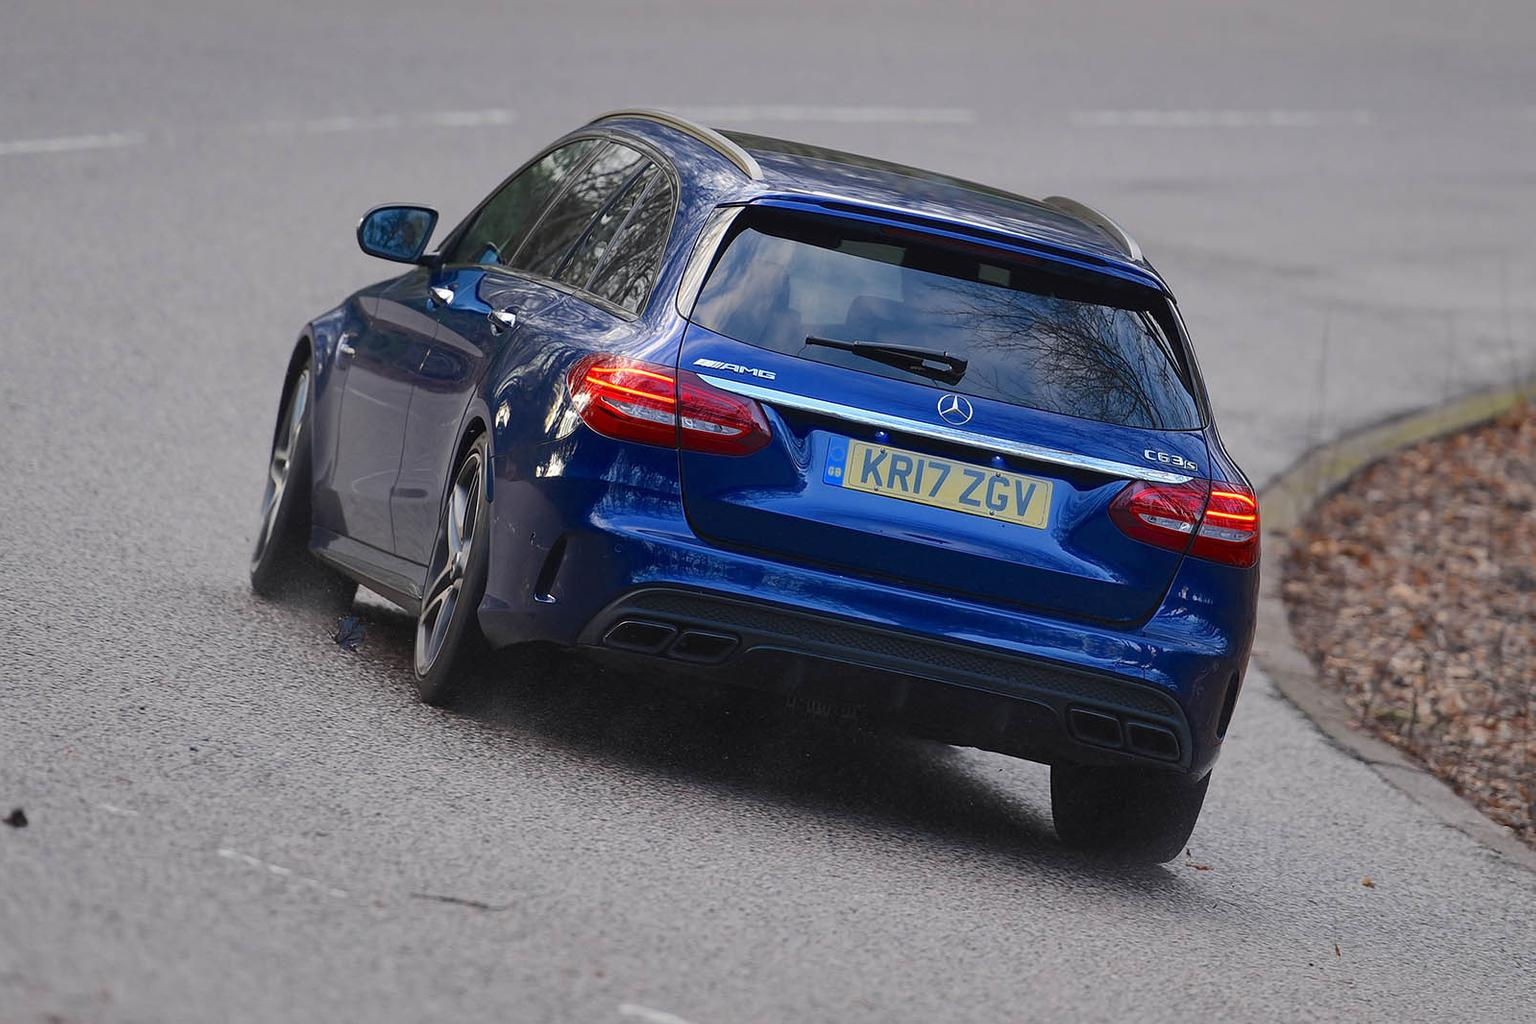 New Audi RS4 Avant vs Mercedes-AMG C63 S Estate